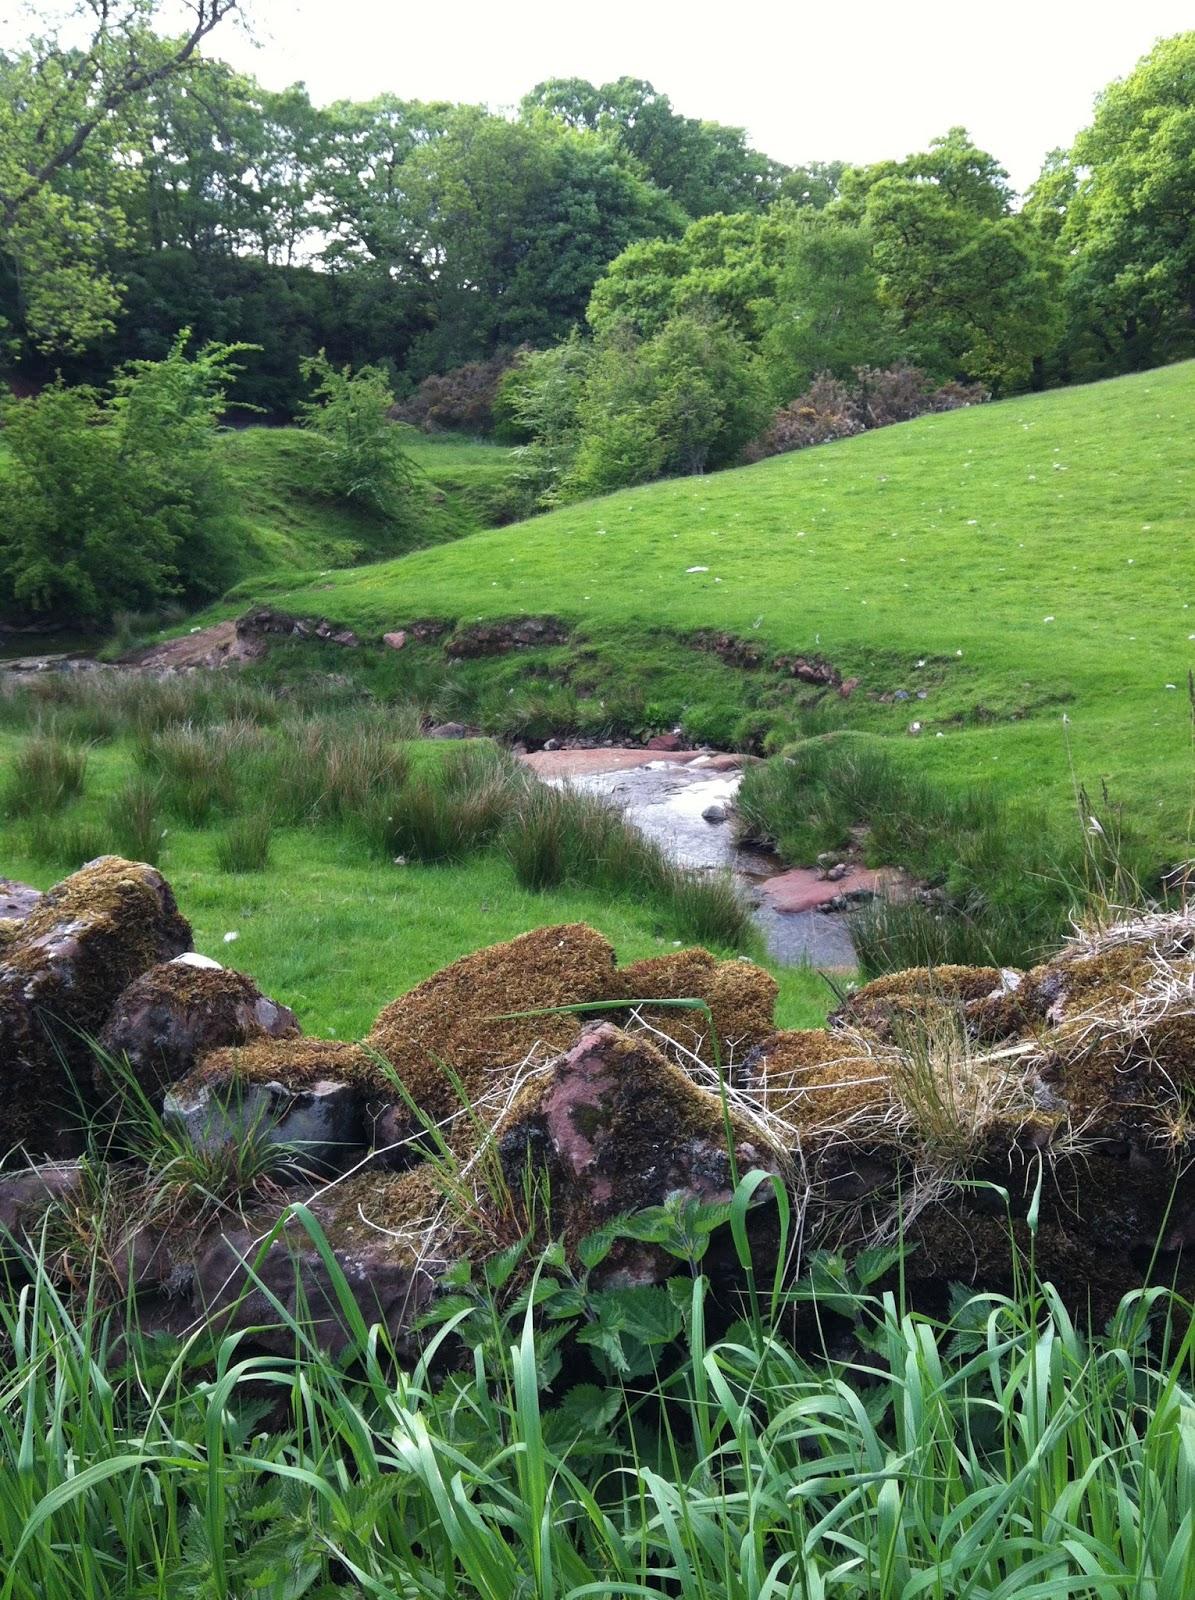 Marjorie deluca 39 s storyworld the real garden of eden - Where is the garden of eden today ...